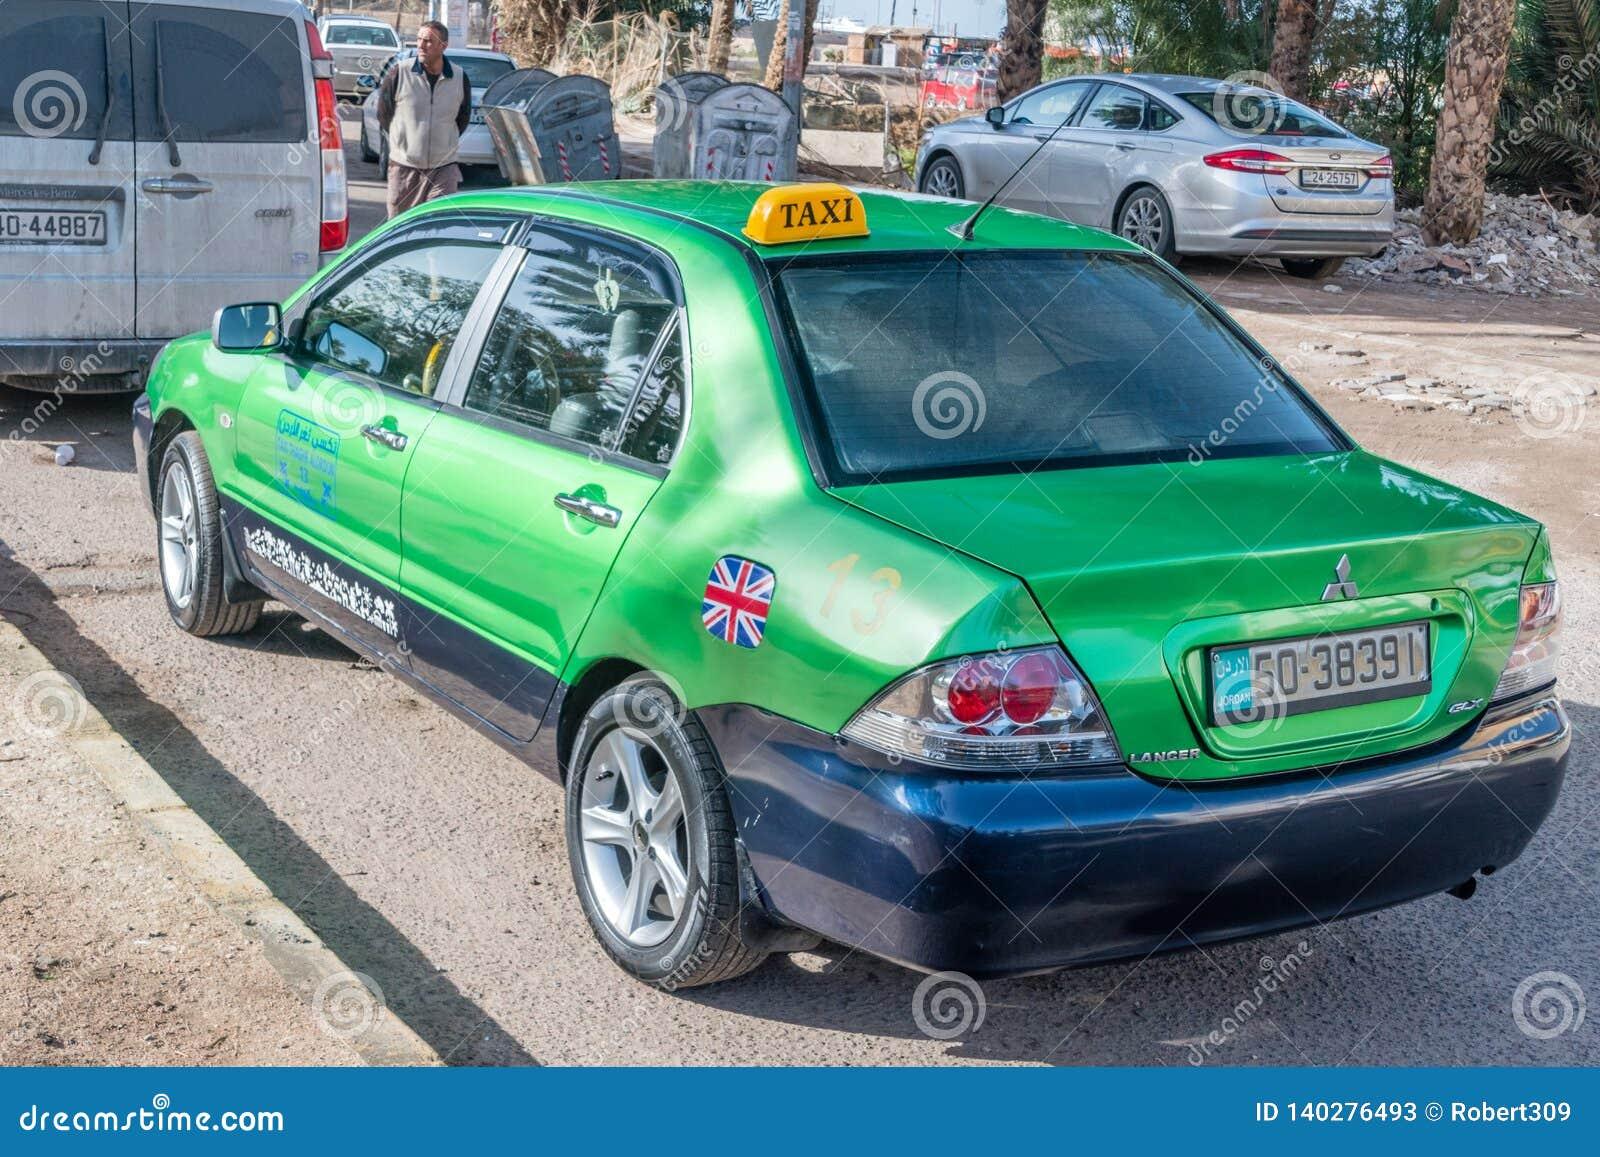 Green Mitsubishi Lancer GLX Taxi Car In Aqaba City Editorial